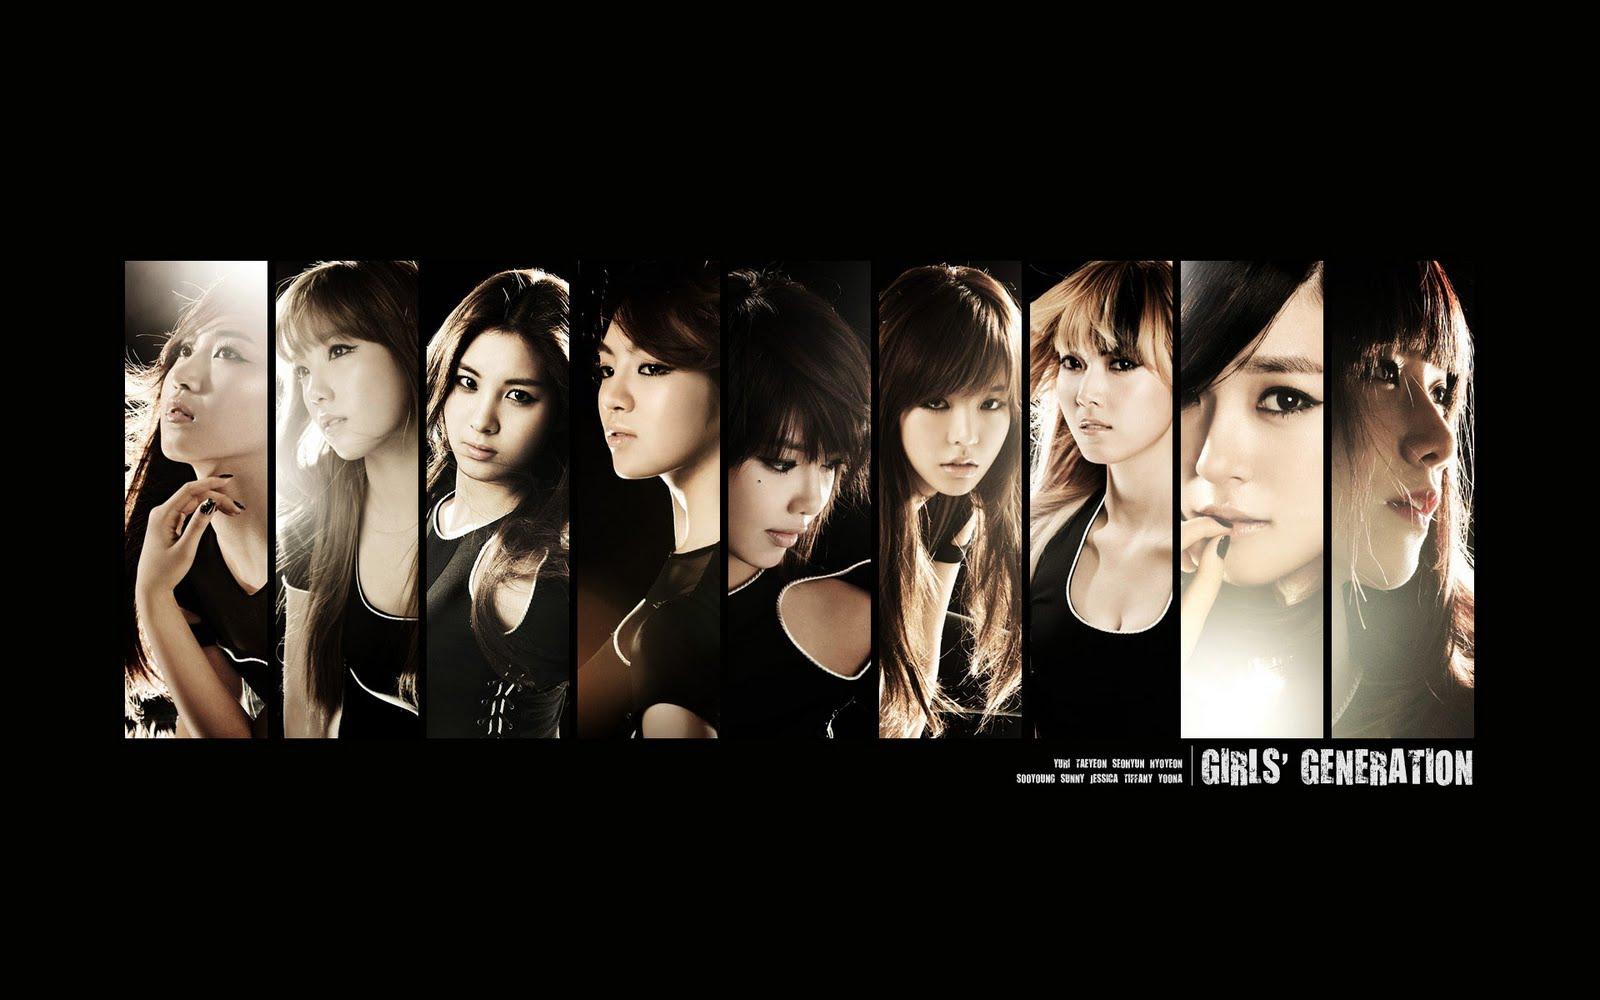 girls generation hd - photo #28